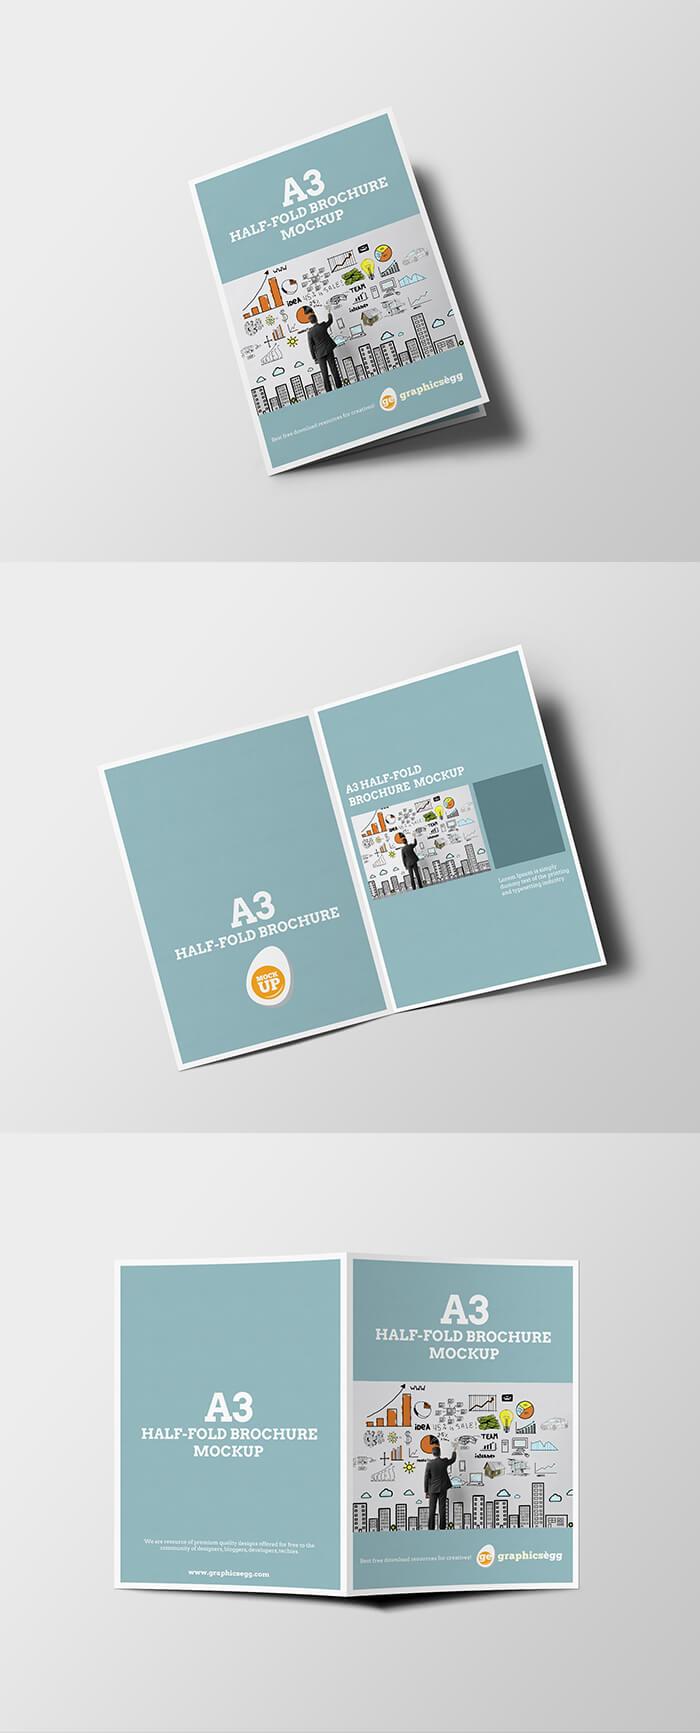 Free Half-fold Brochure Mockup PSD Template1